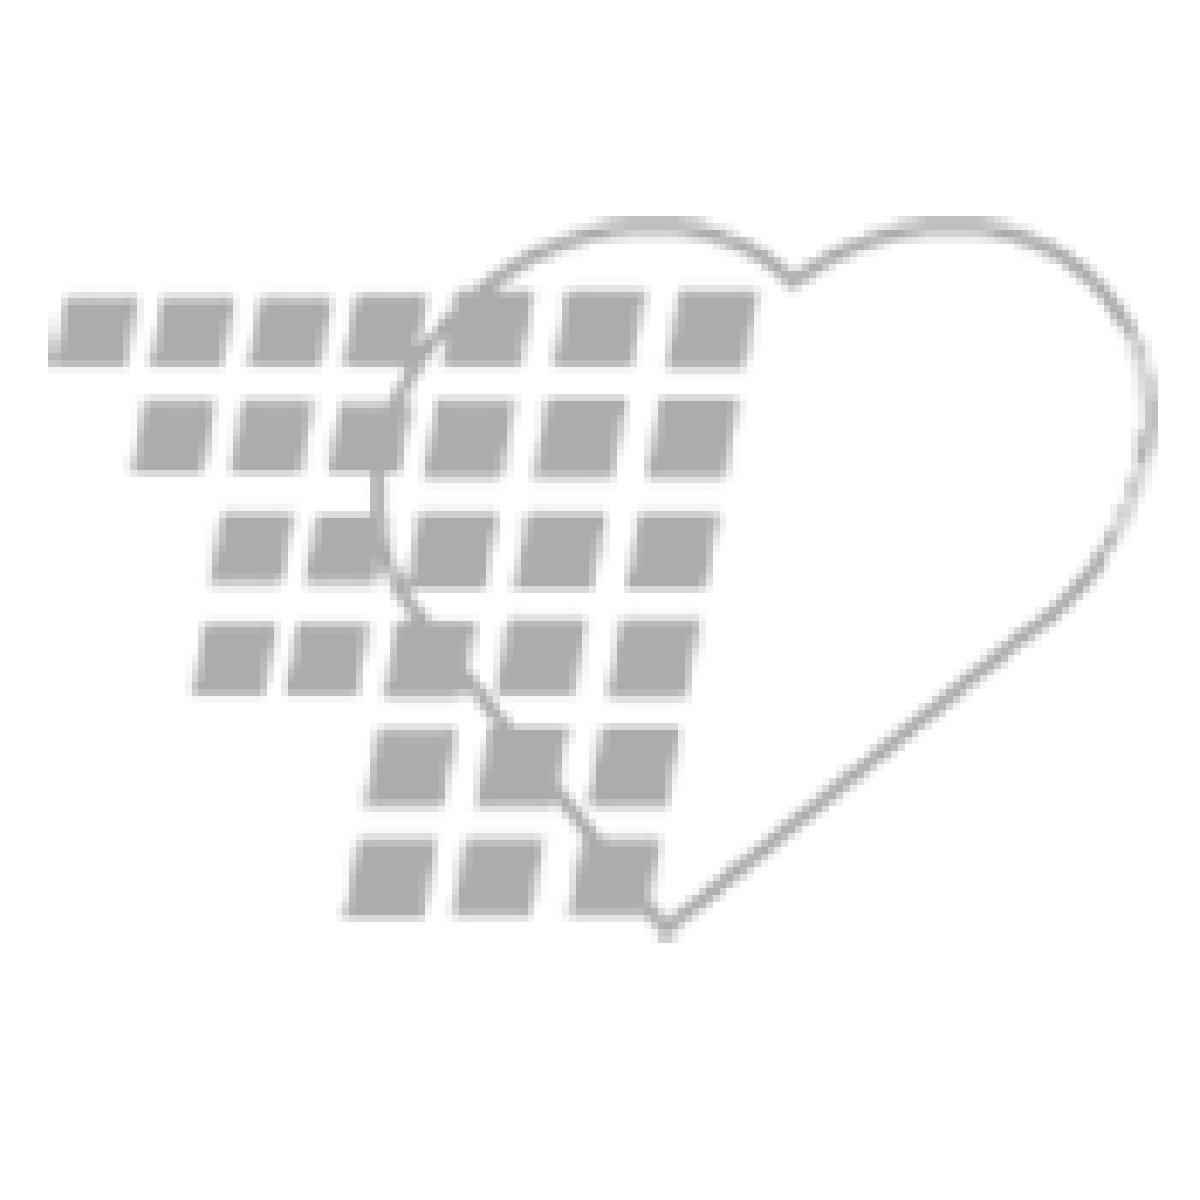 11-81-2141 Simulaids Sani-Child Face/Lung System